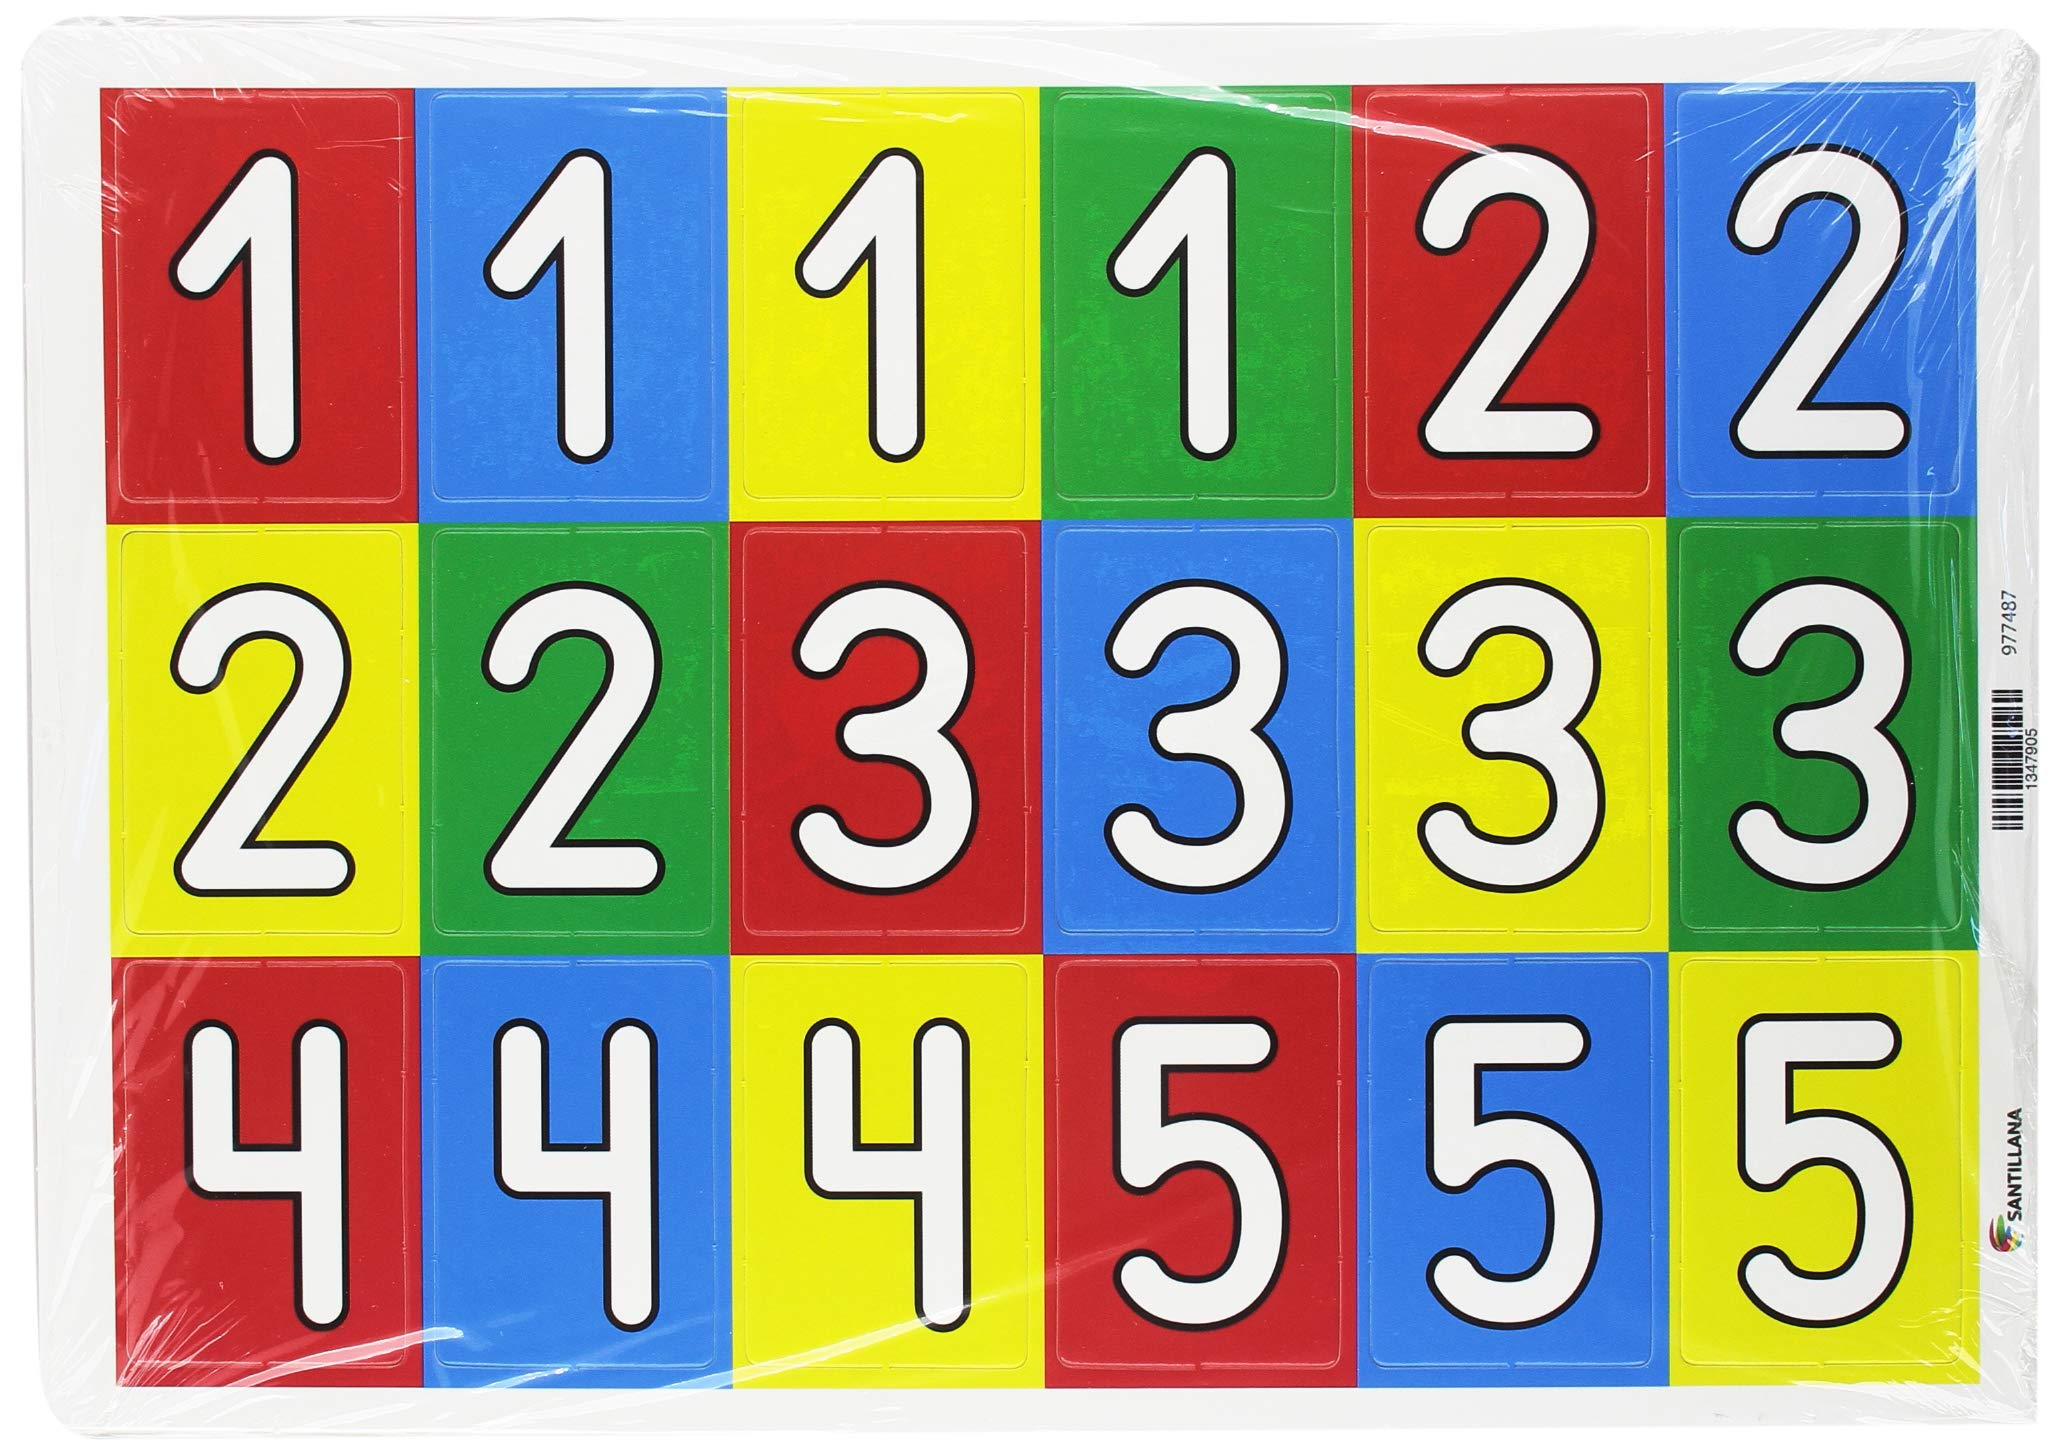 Taller Matematicas Manipulativas Nivel 1 Amazon Es Vv Aa Vv Aa Libros